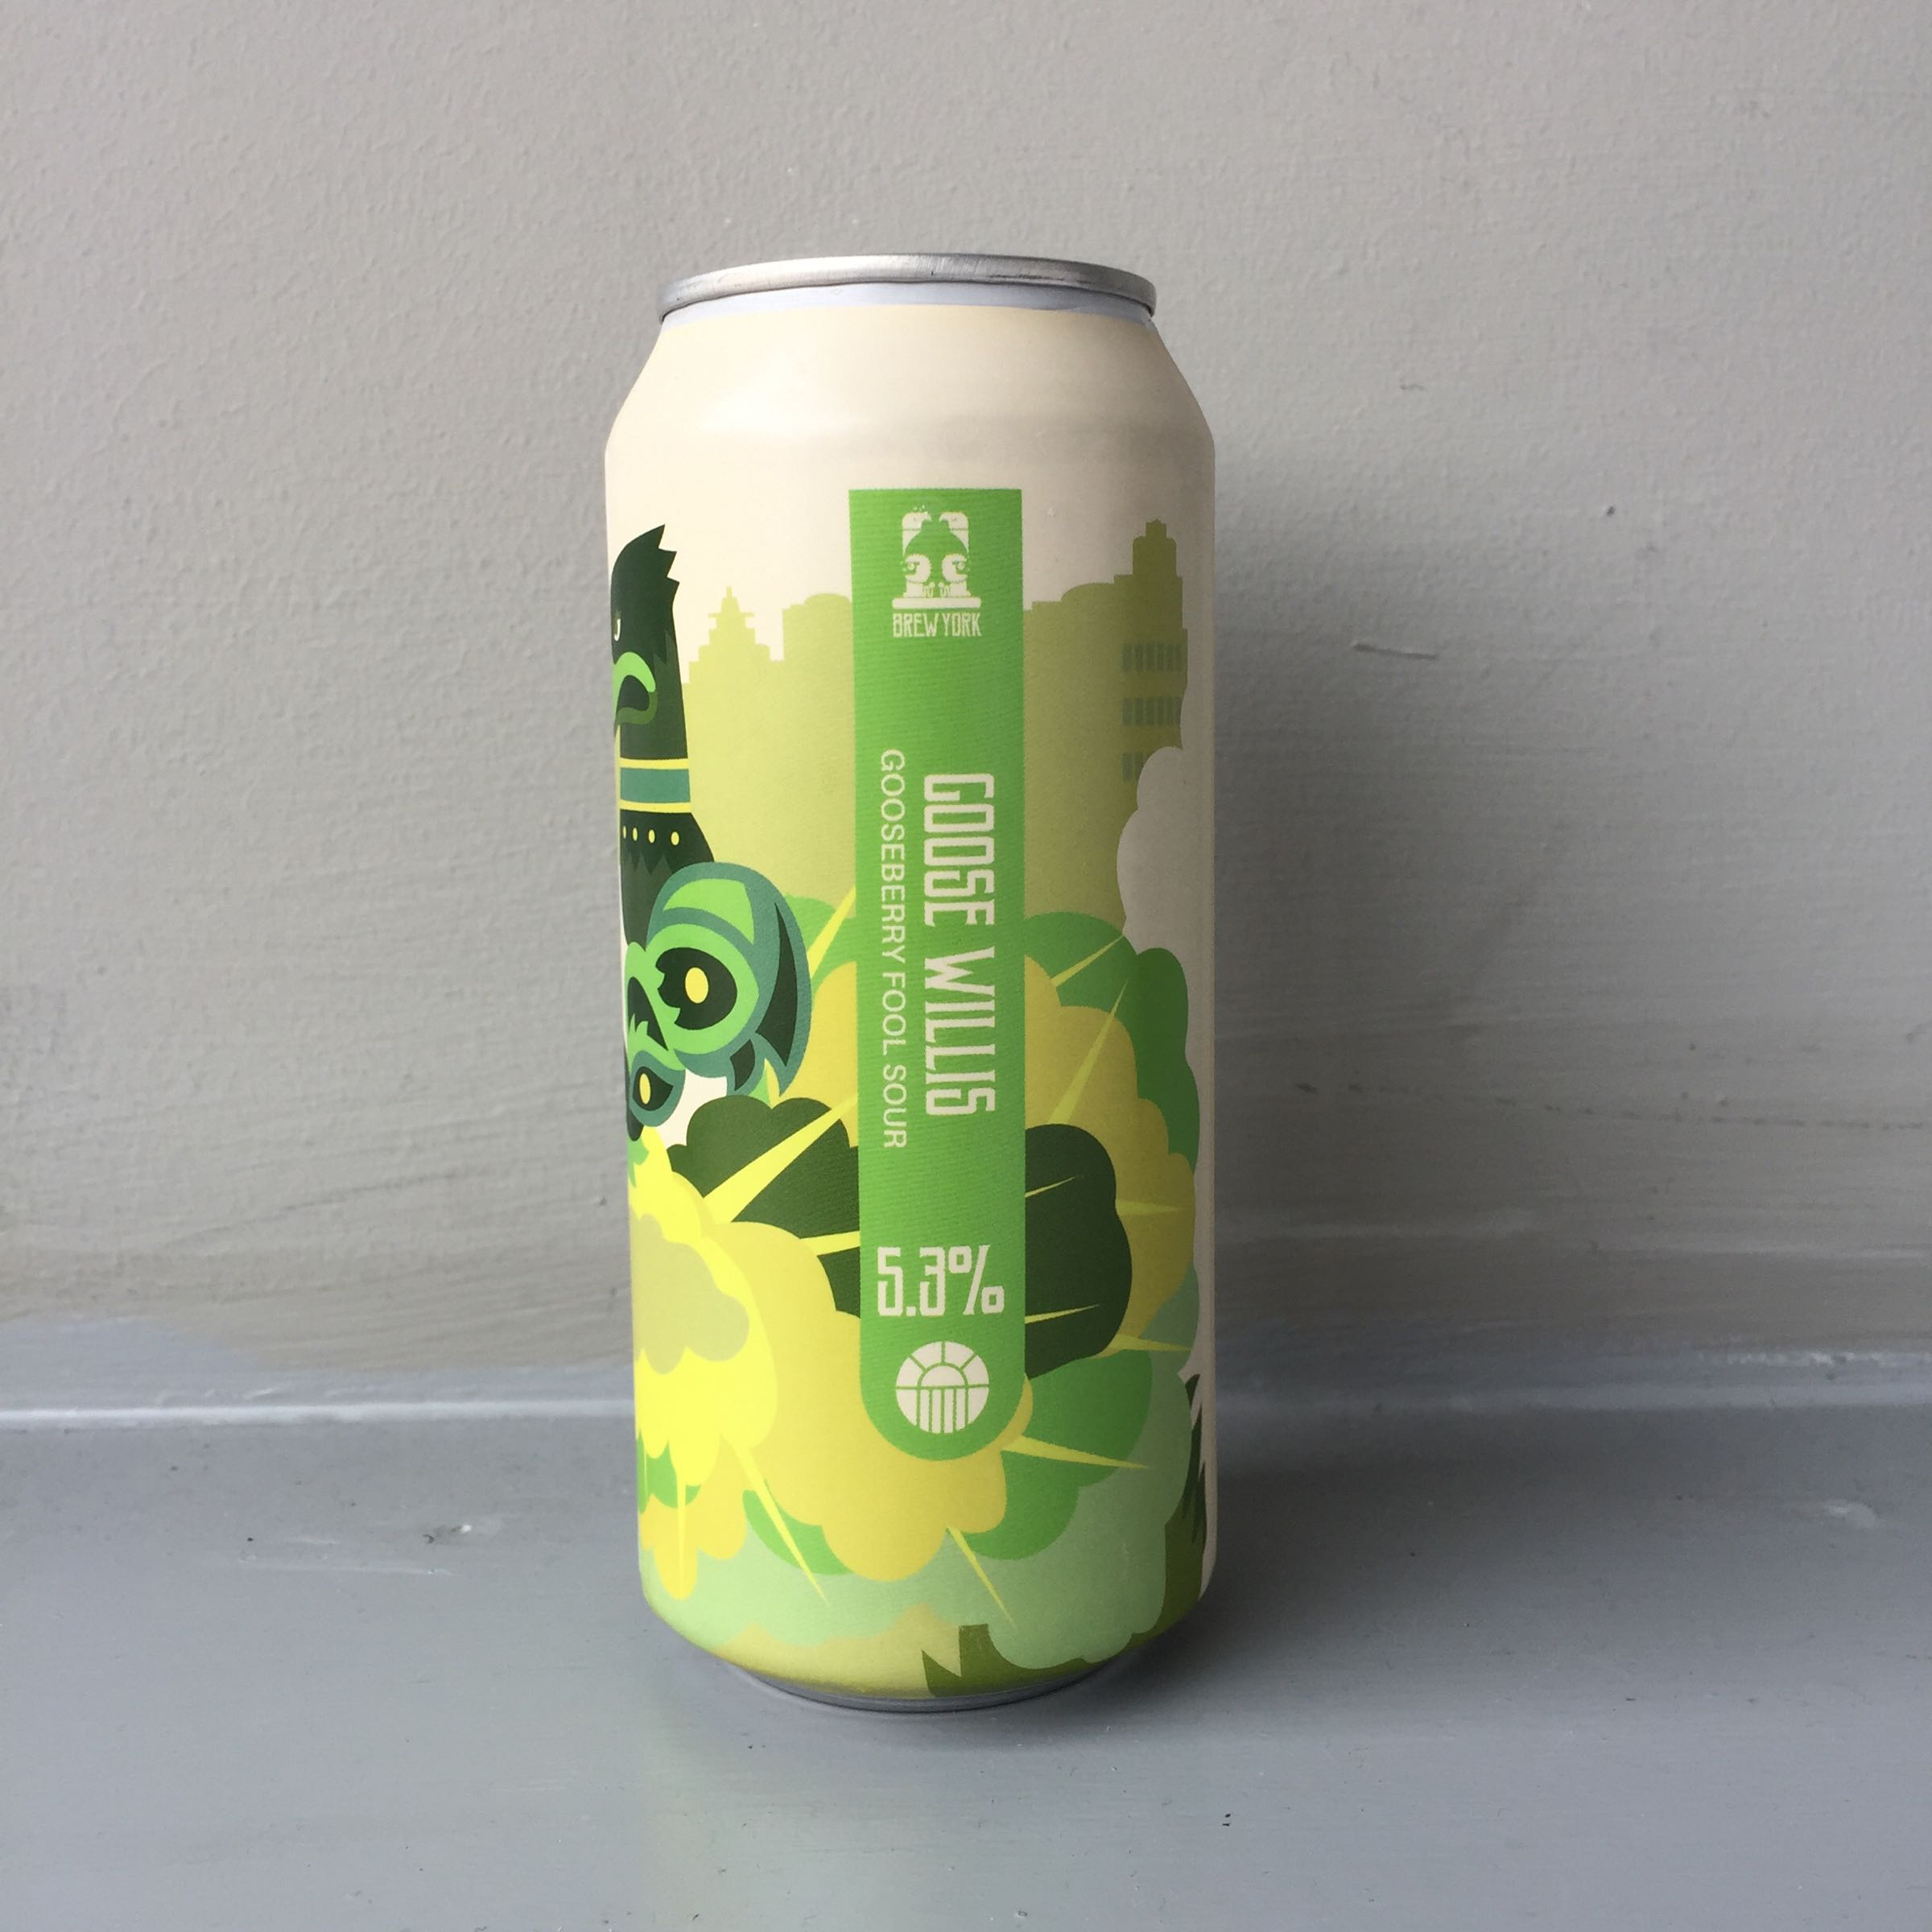 Brew York 'Goose Willis' Gooseberry Fool Sour 440ml 5.3% ABV